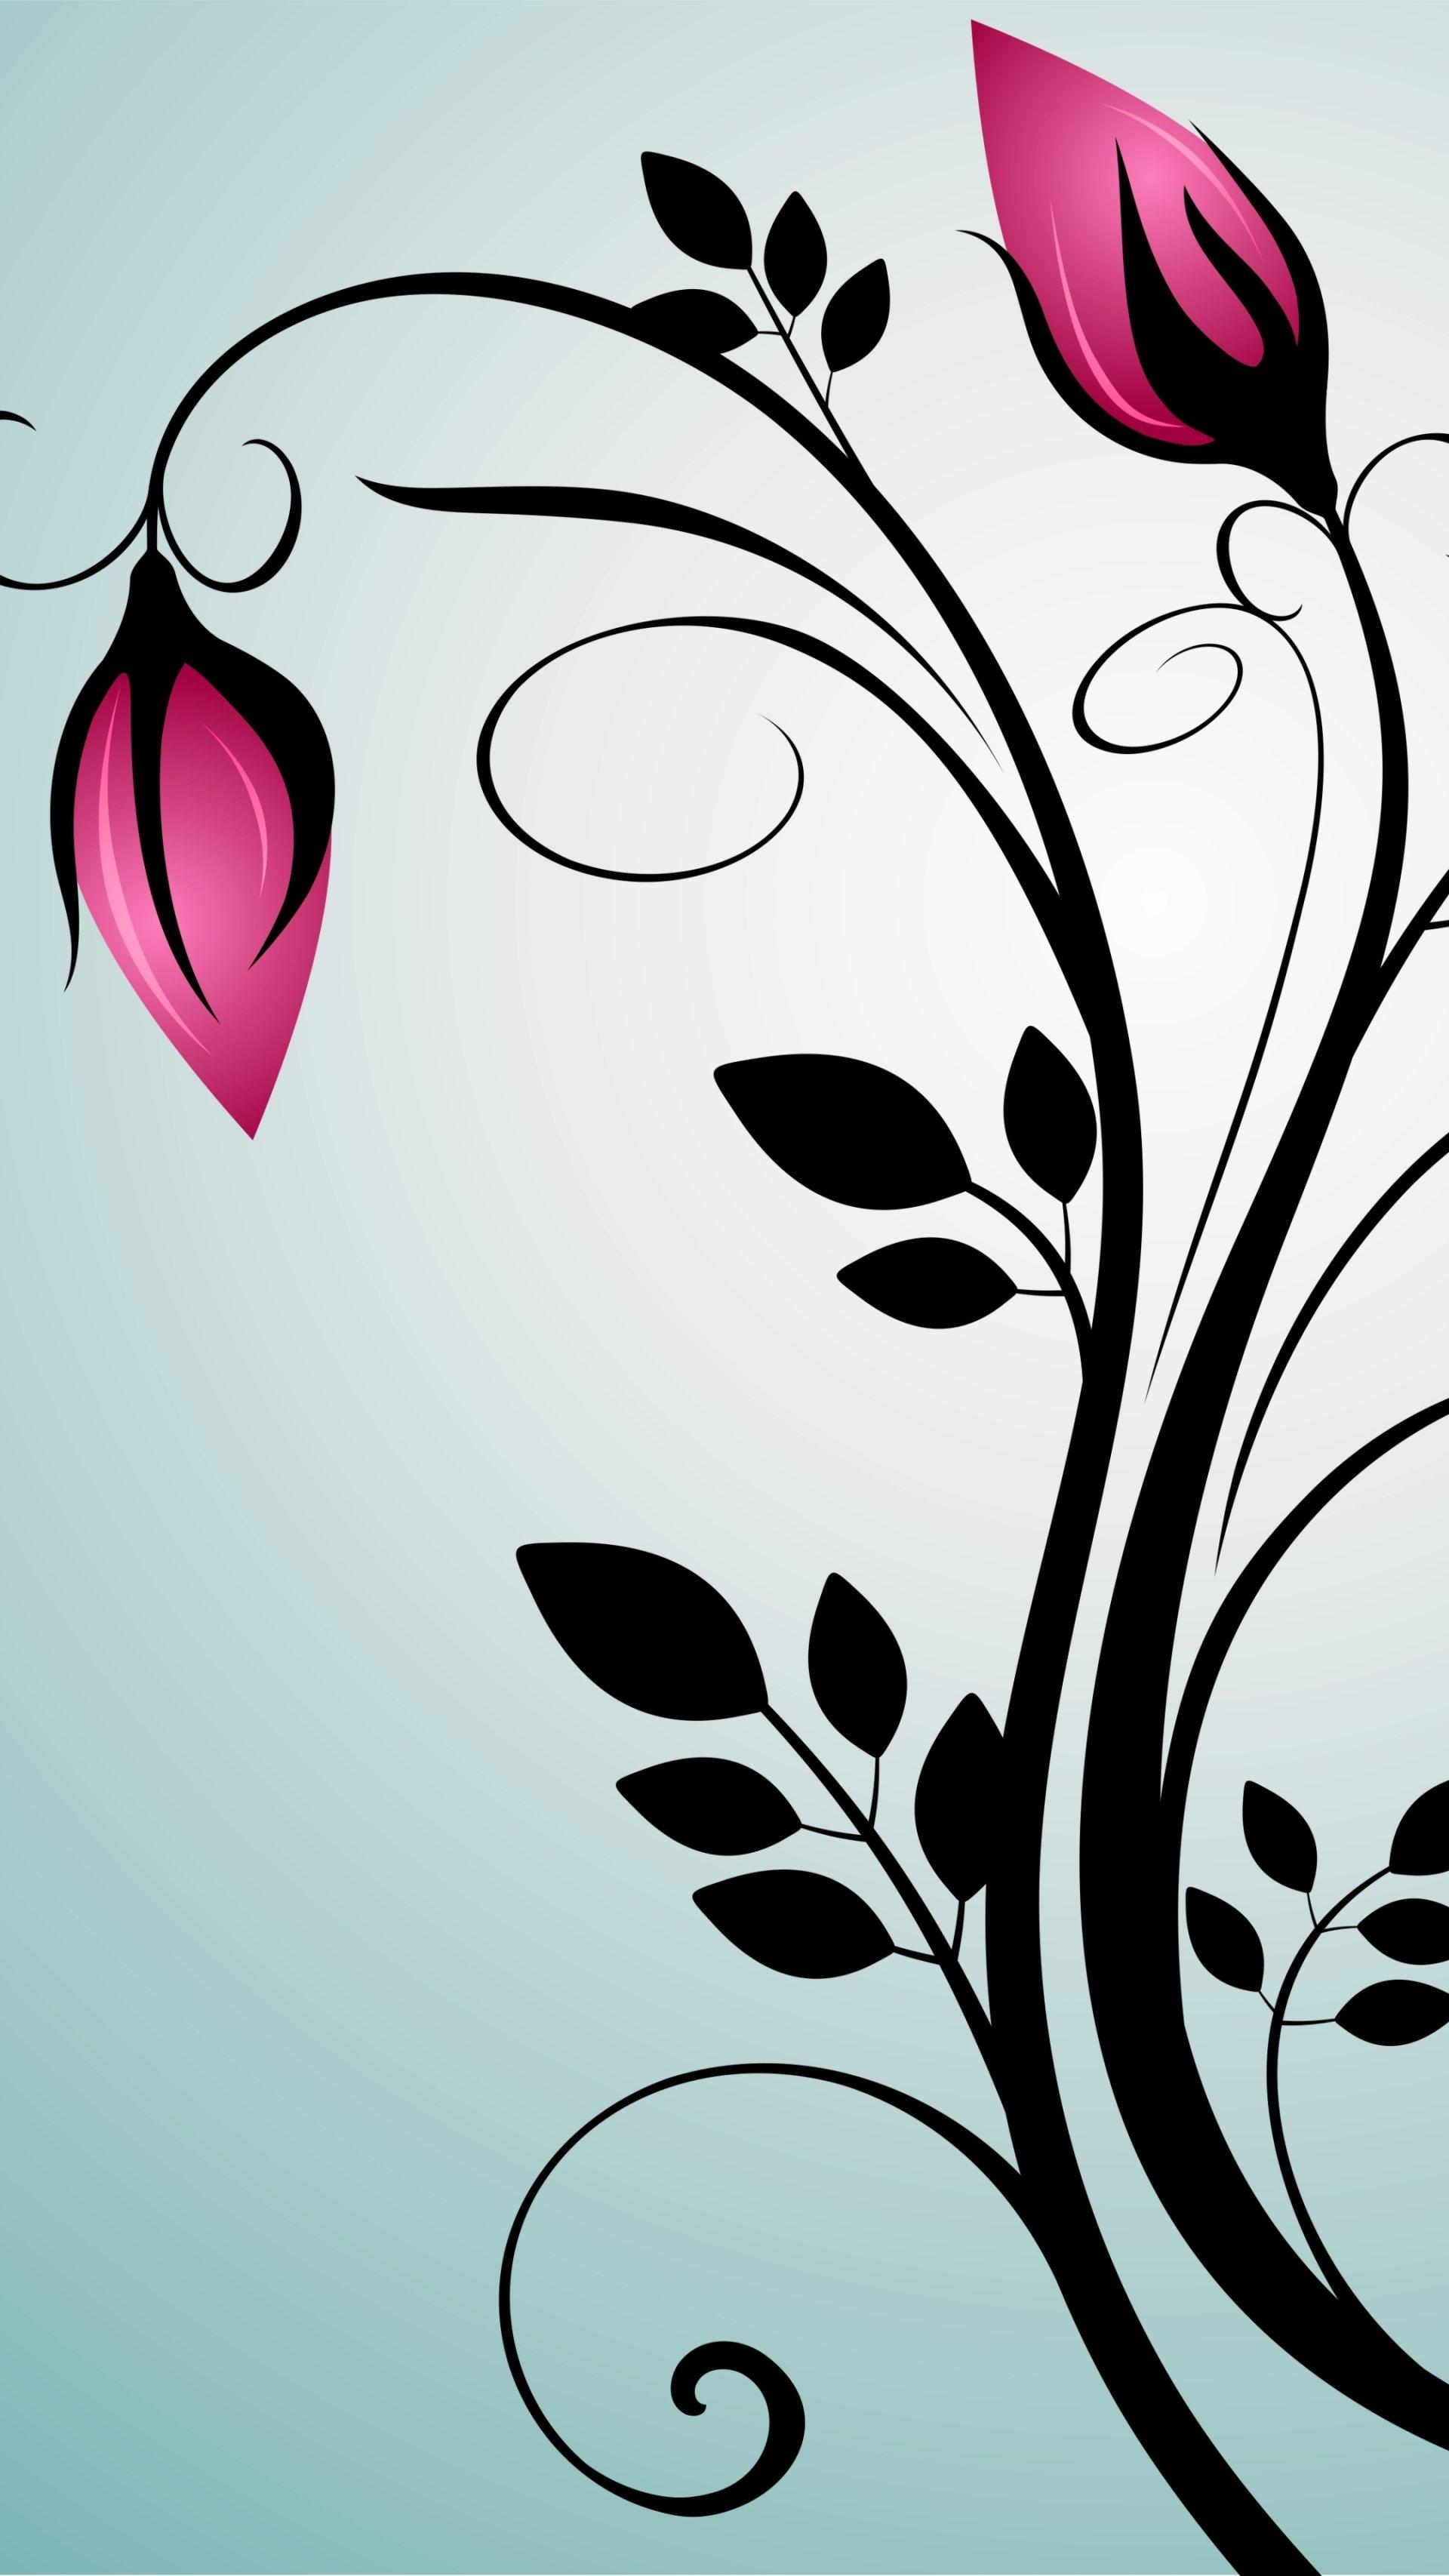 Wallpaper 912973